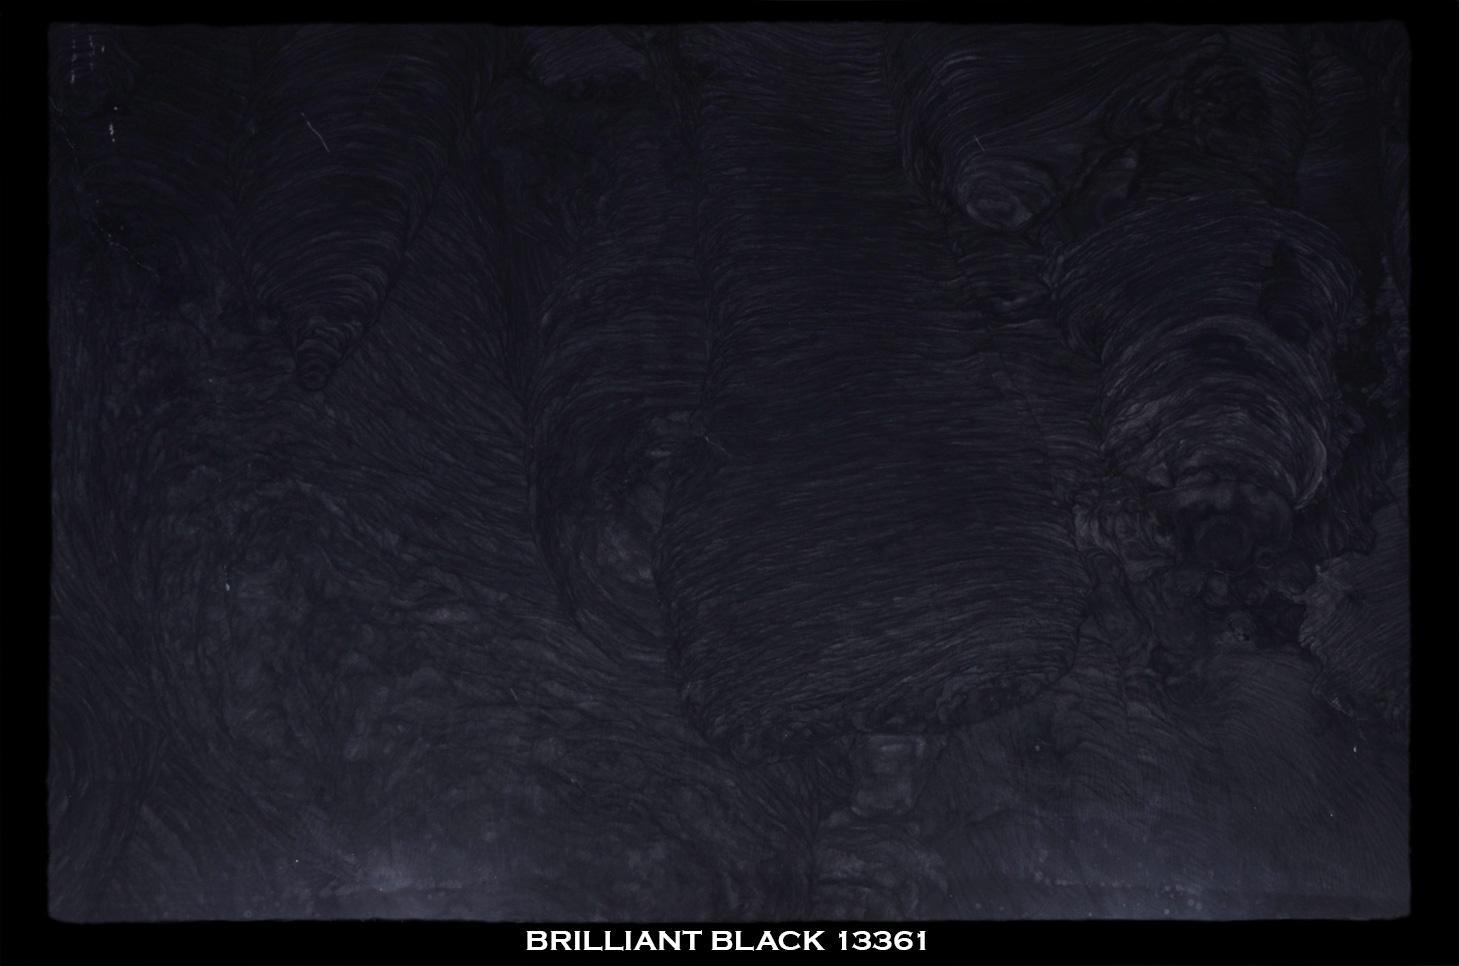 BRILLIANT-BLACK-13361-SLAB